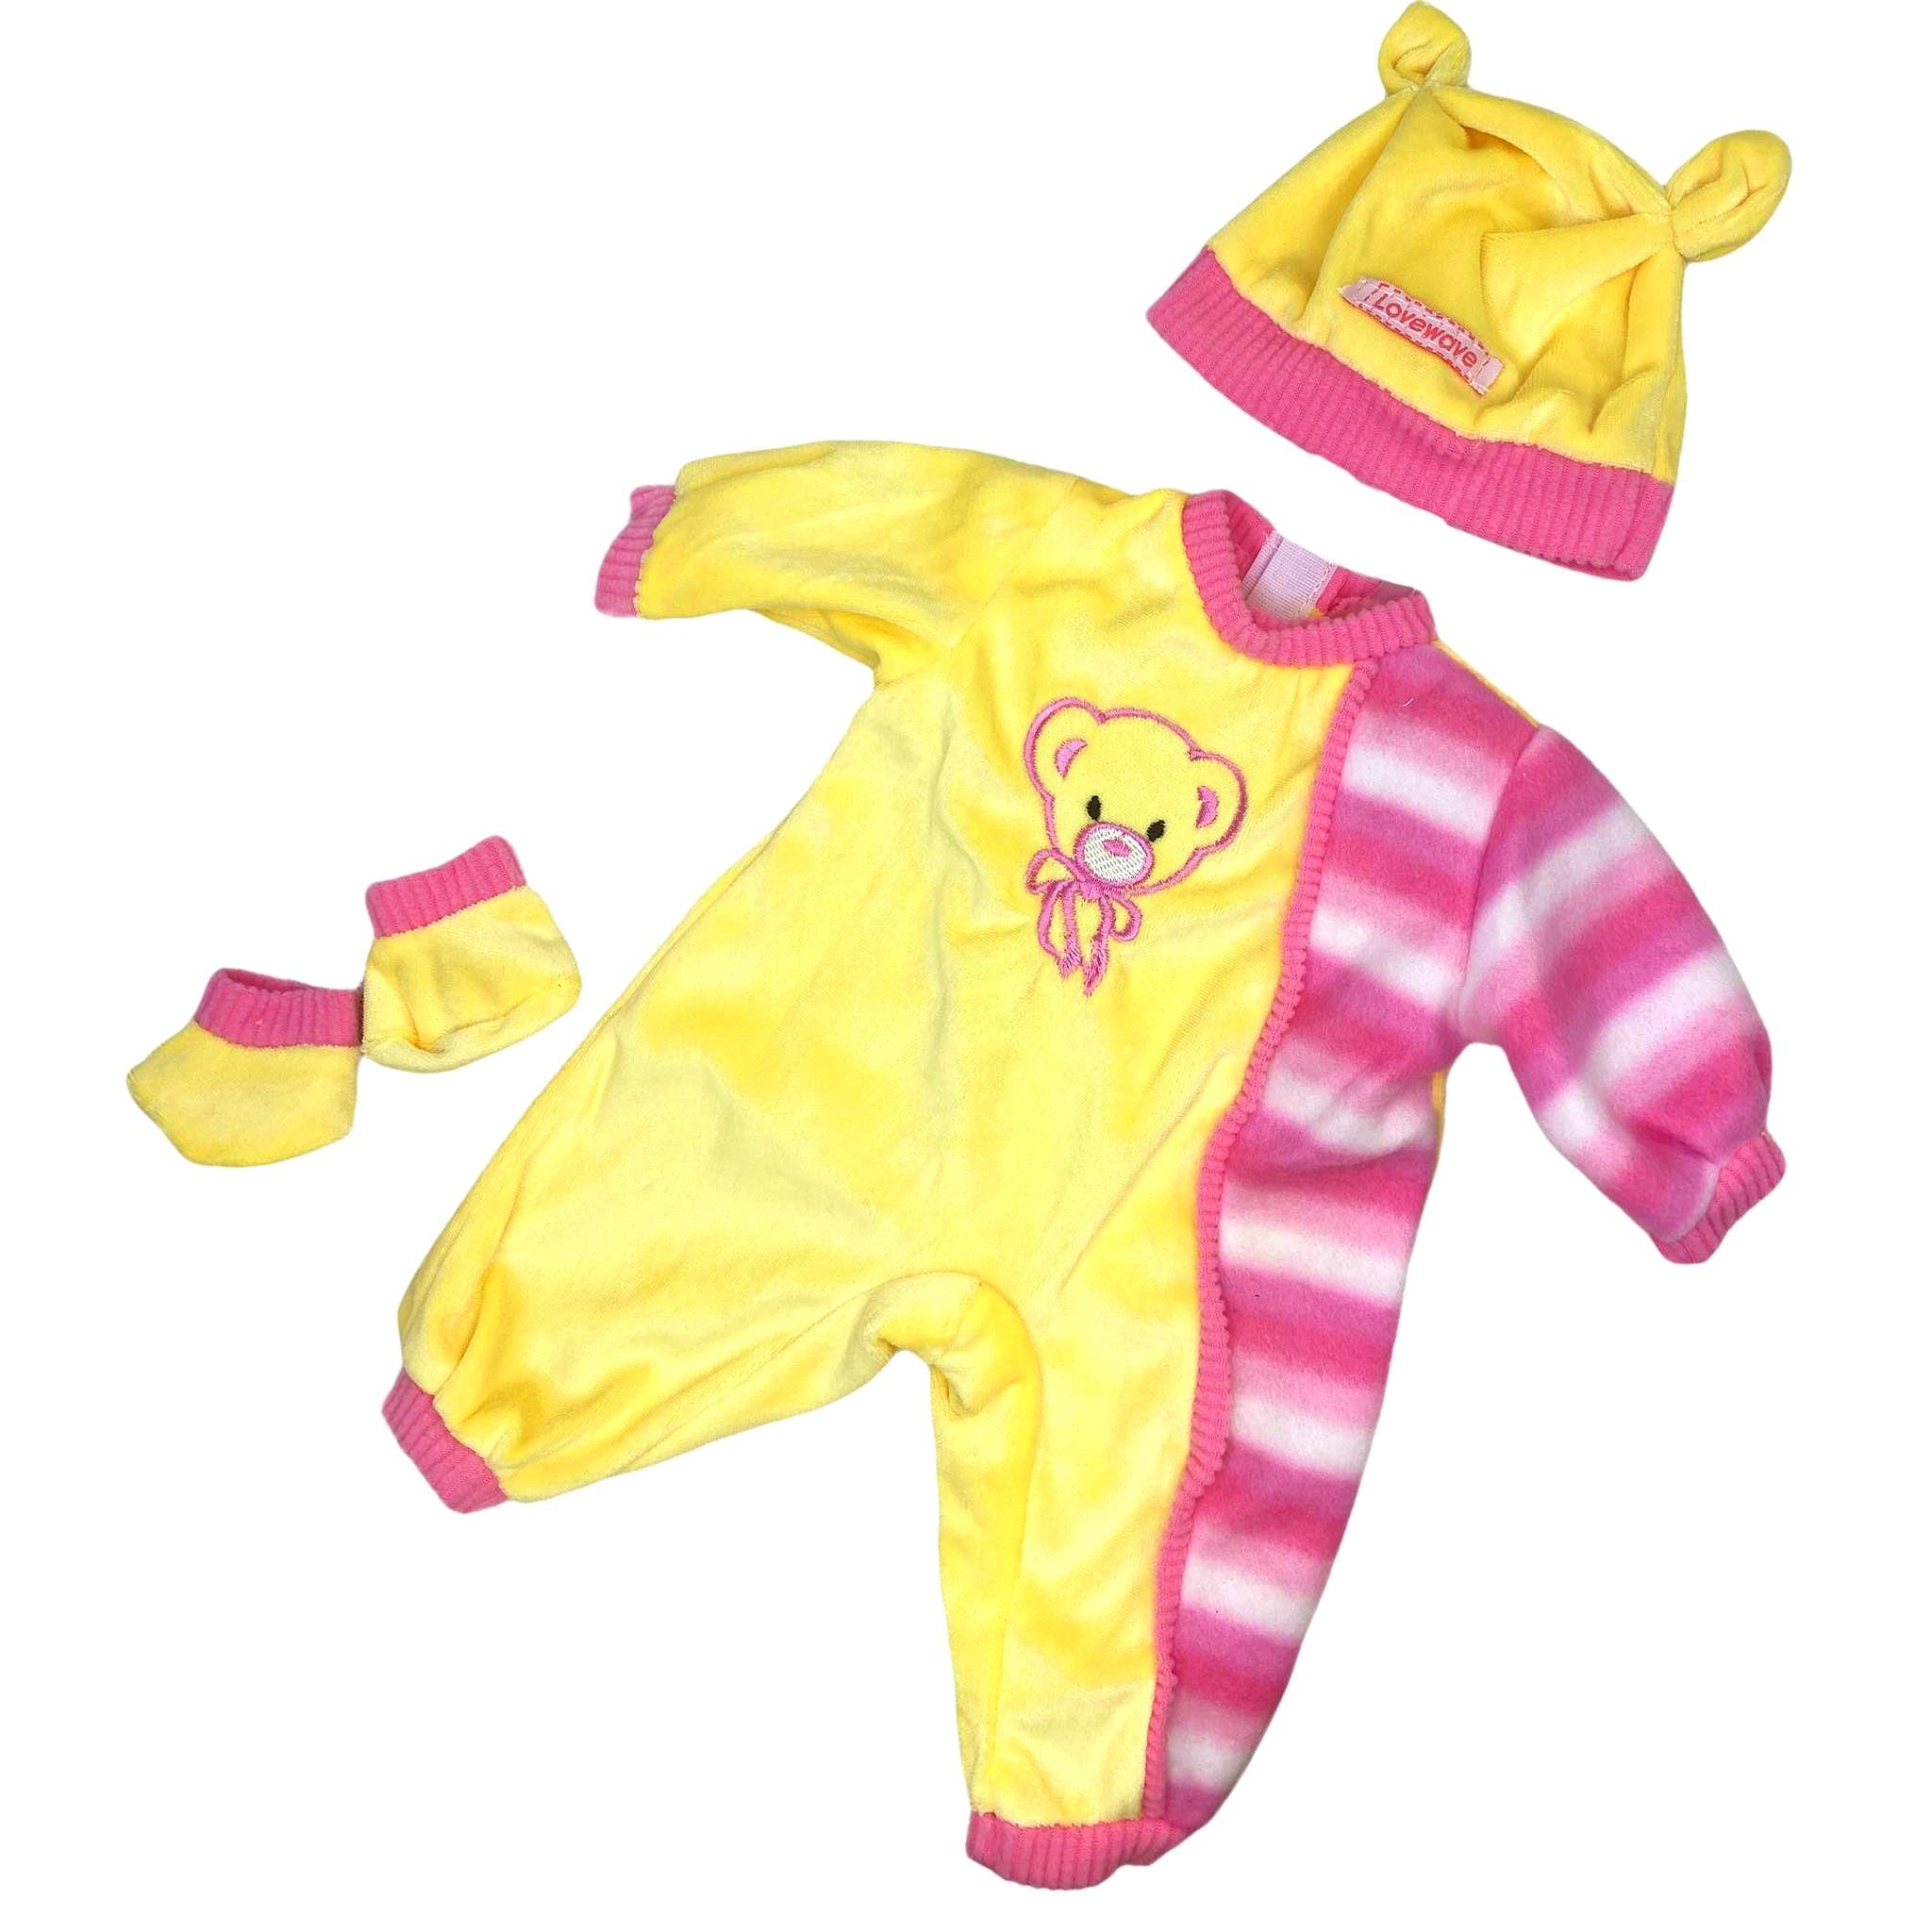 Ubranko dla lalki bobas 40 cm